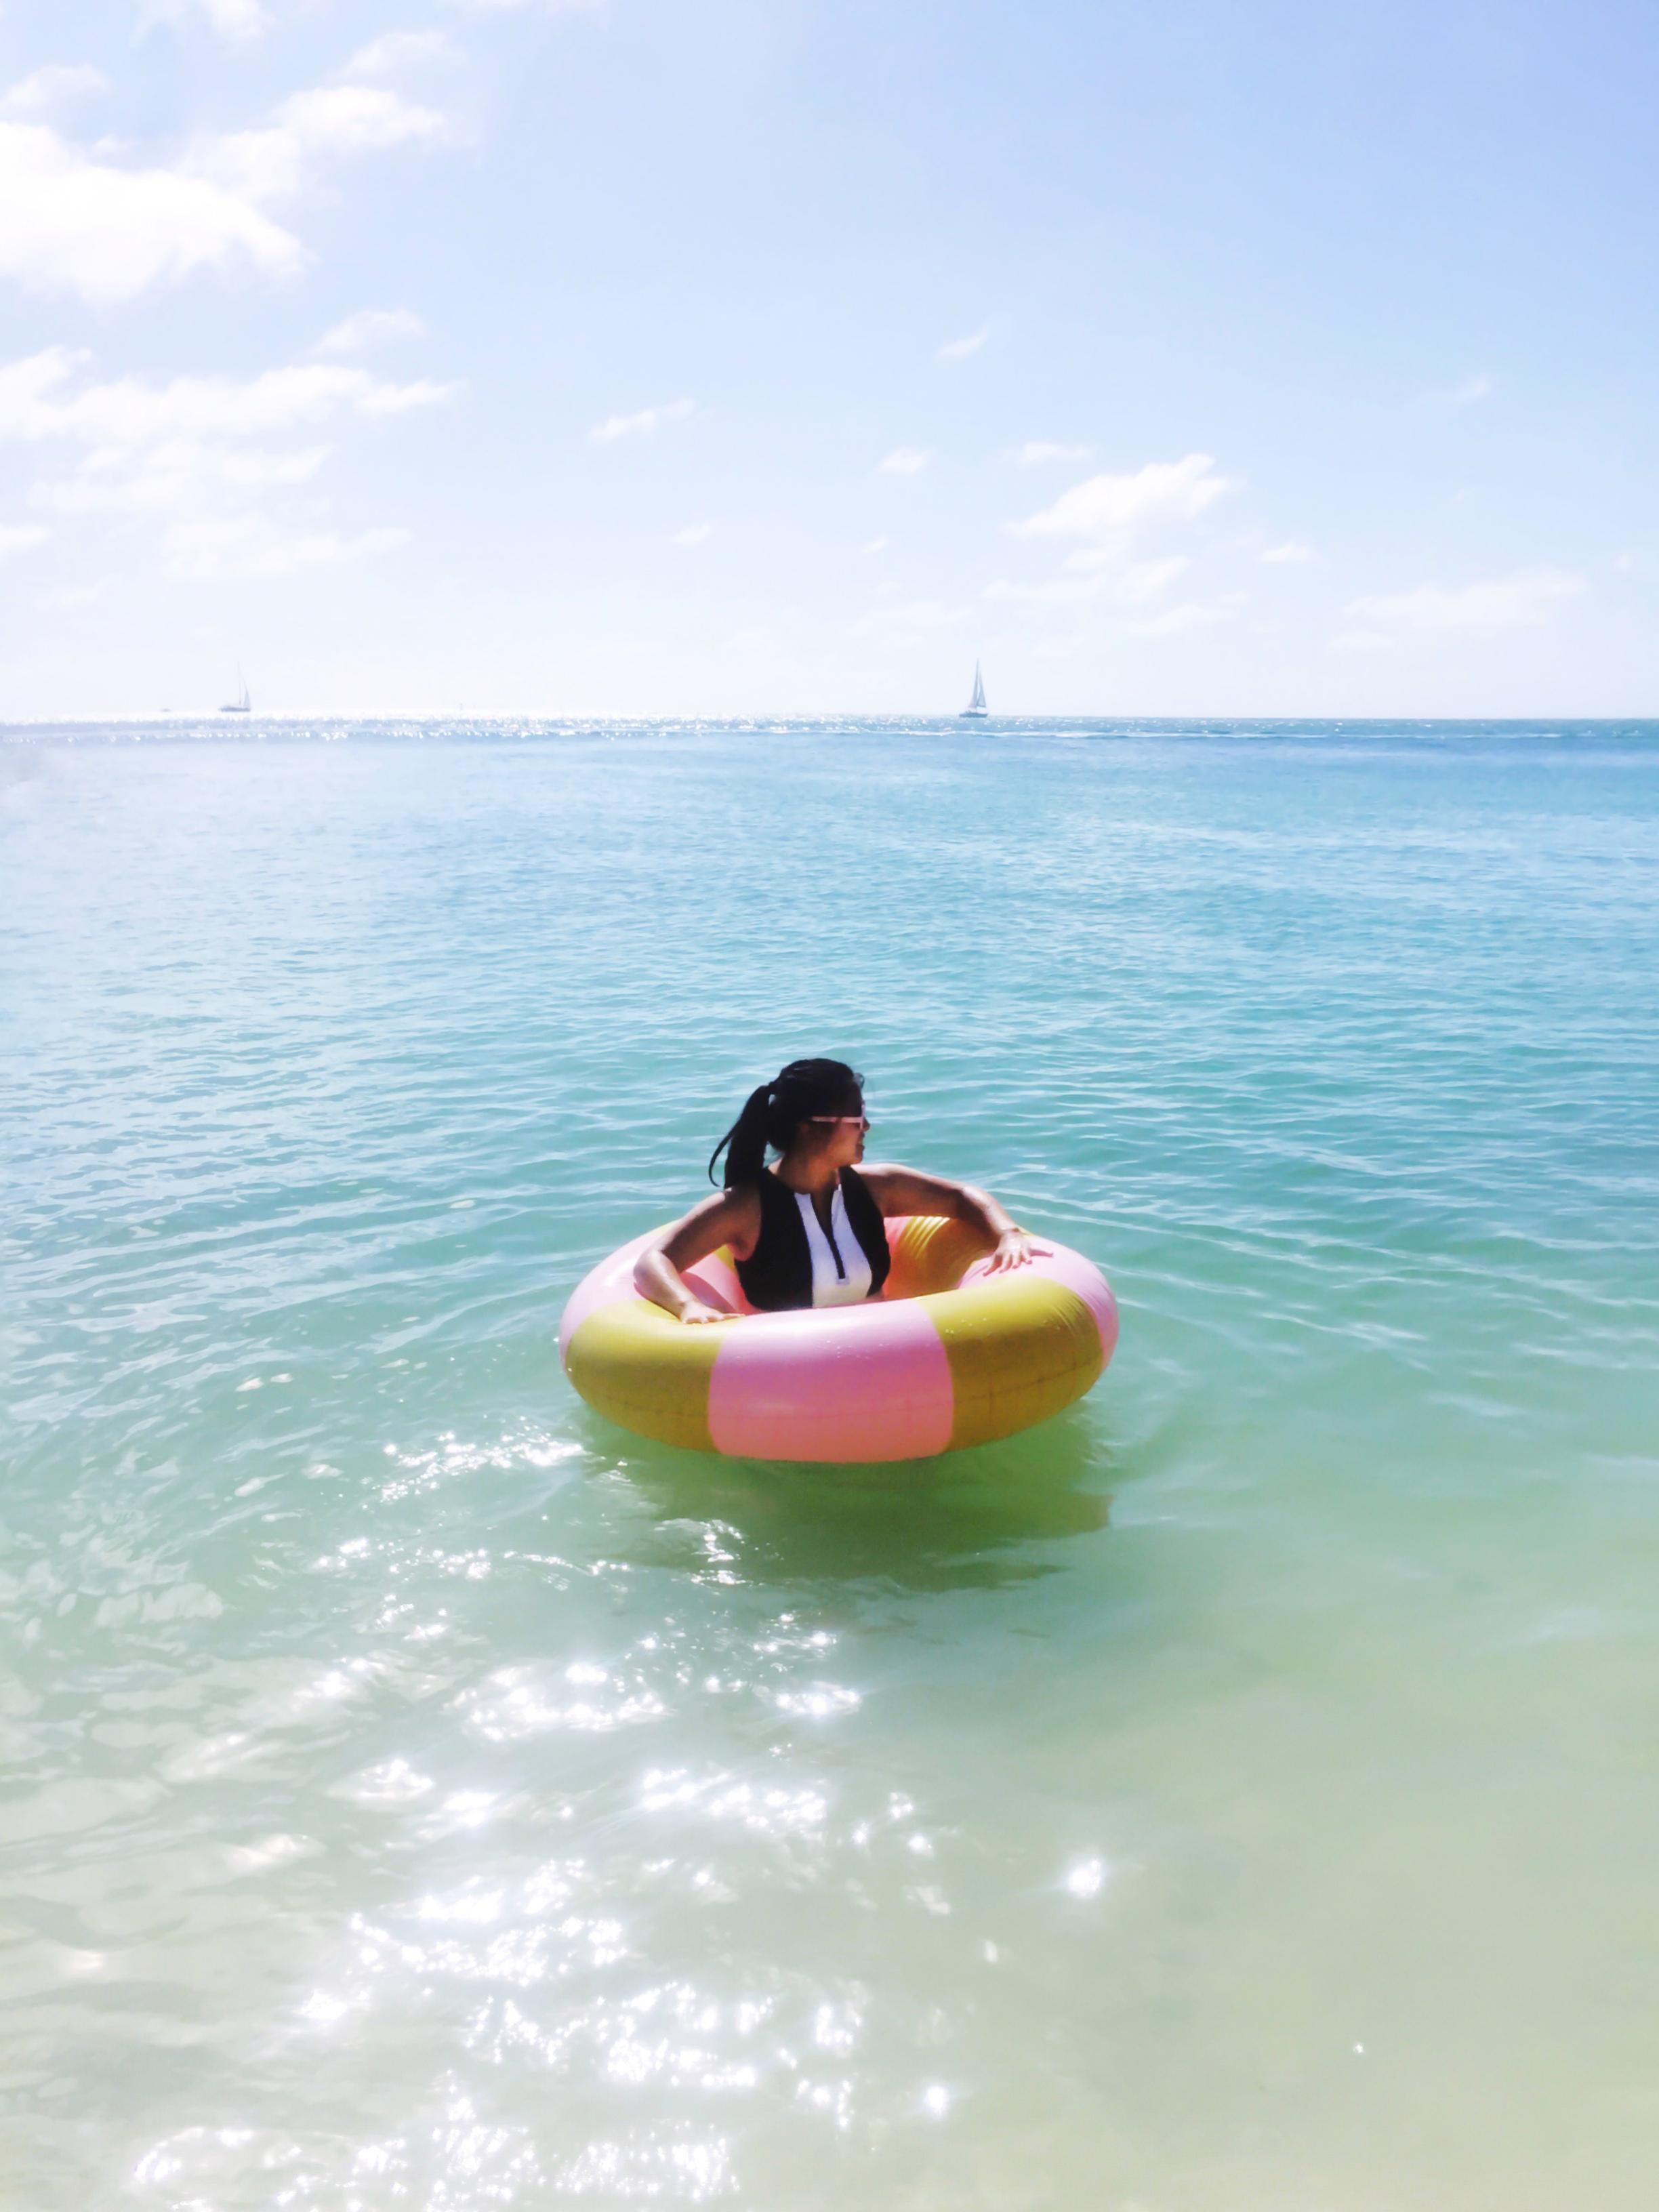 amy_chen_design_fort_zachary_taylor_state_park_florida_fl_key_west_zac_travel_vacation